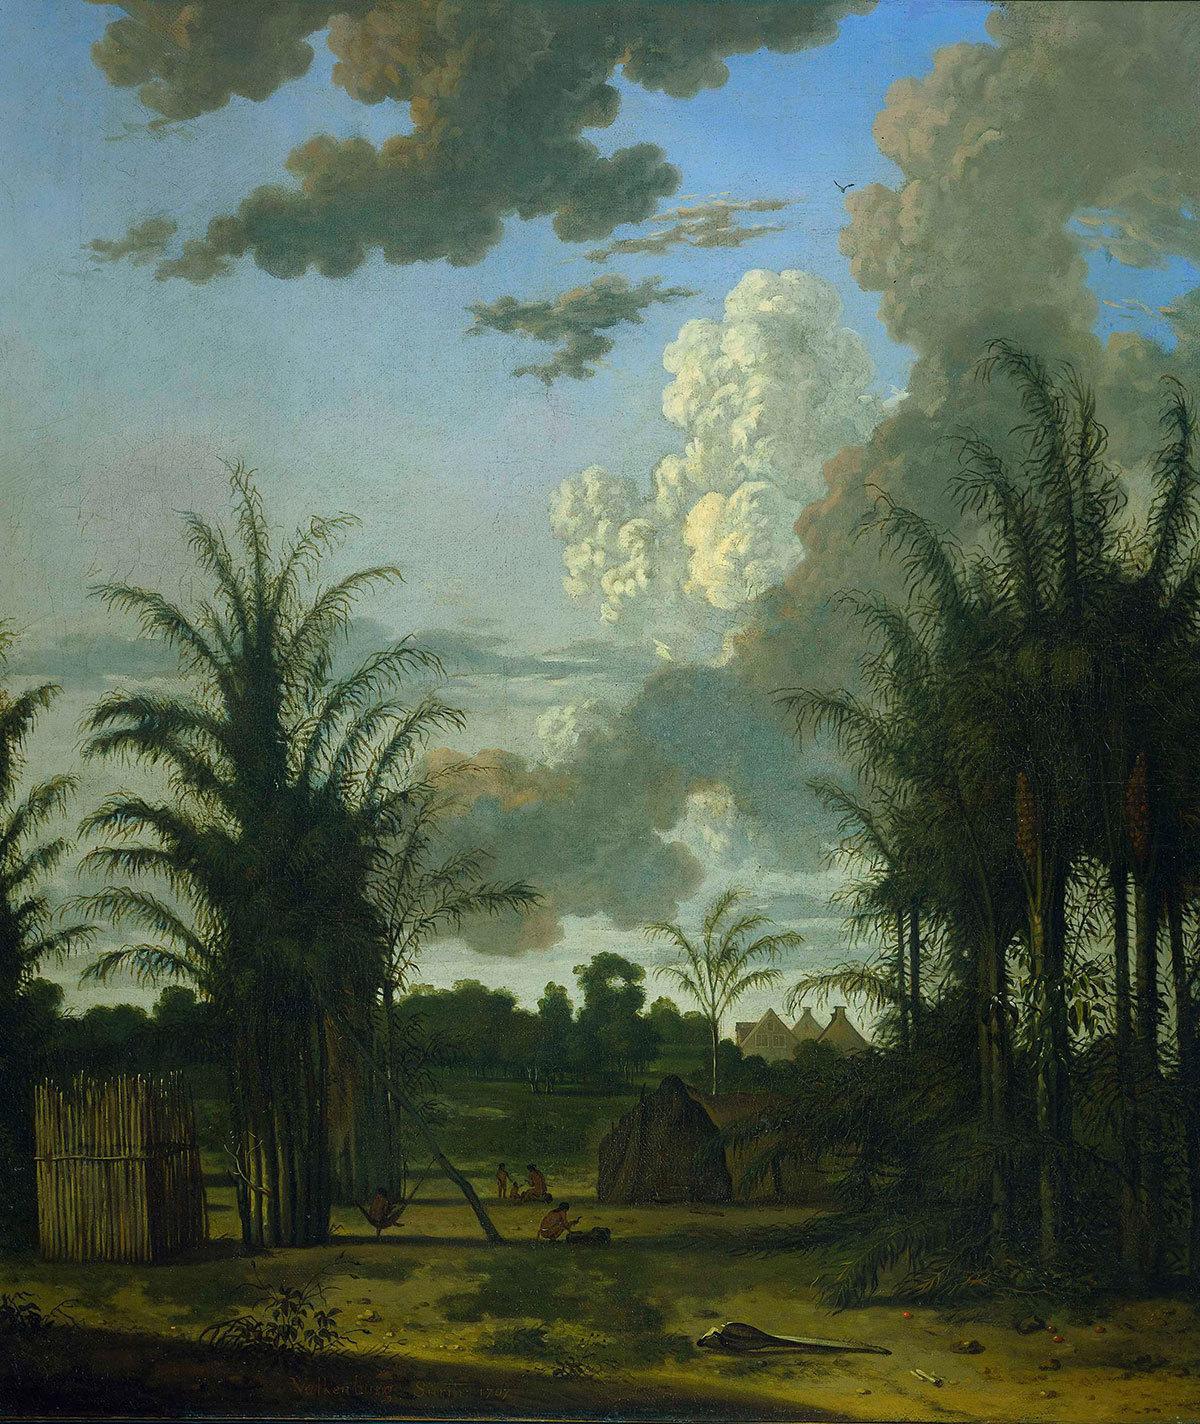 A plantation in Suriname, 1707, Dirk Valkenburg, Rijksmuseum, Public Domain Mark